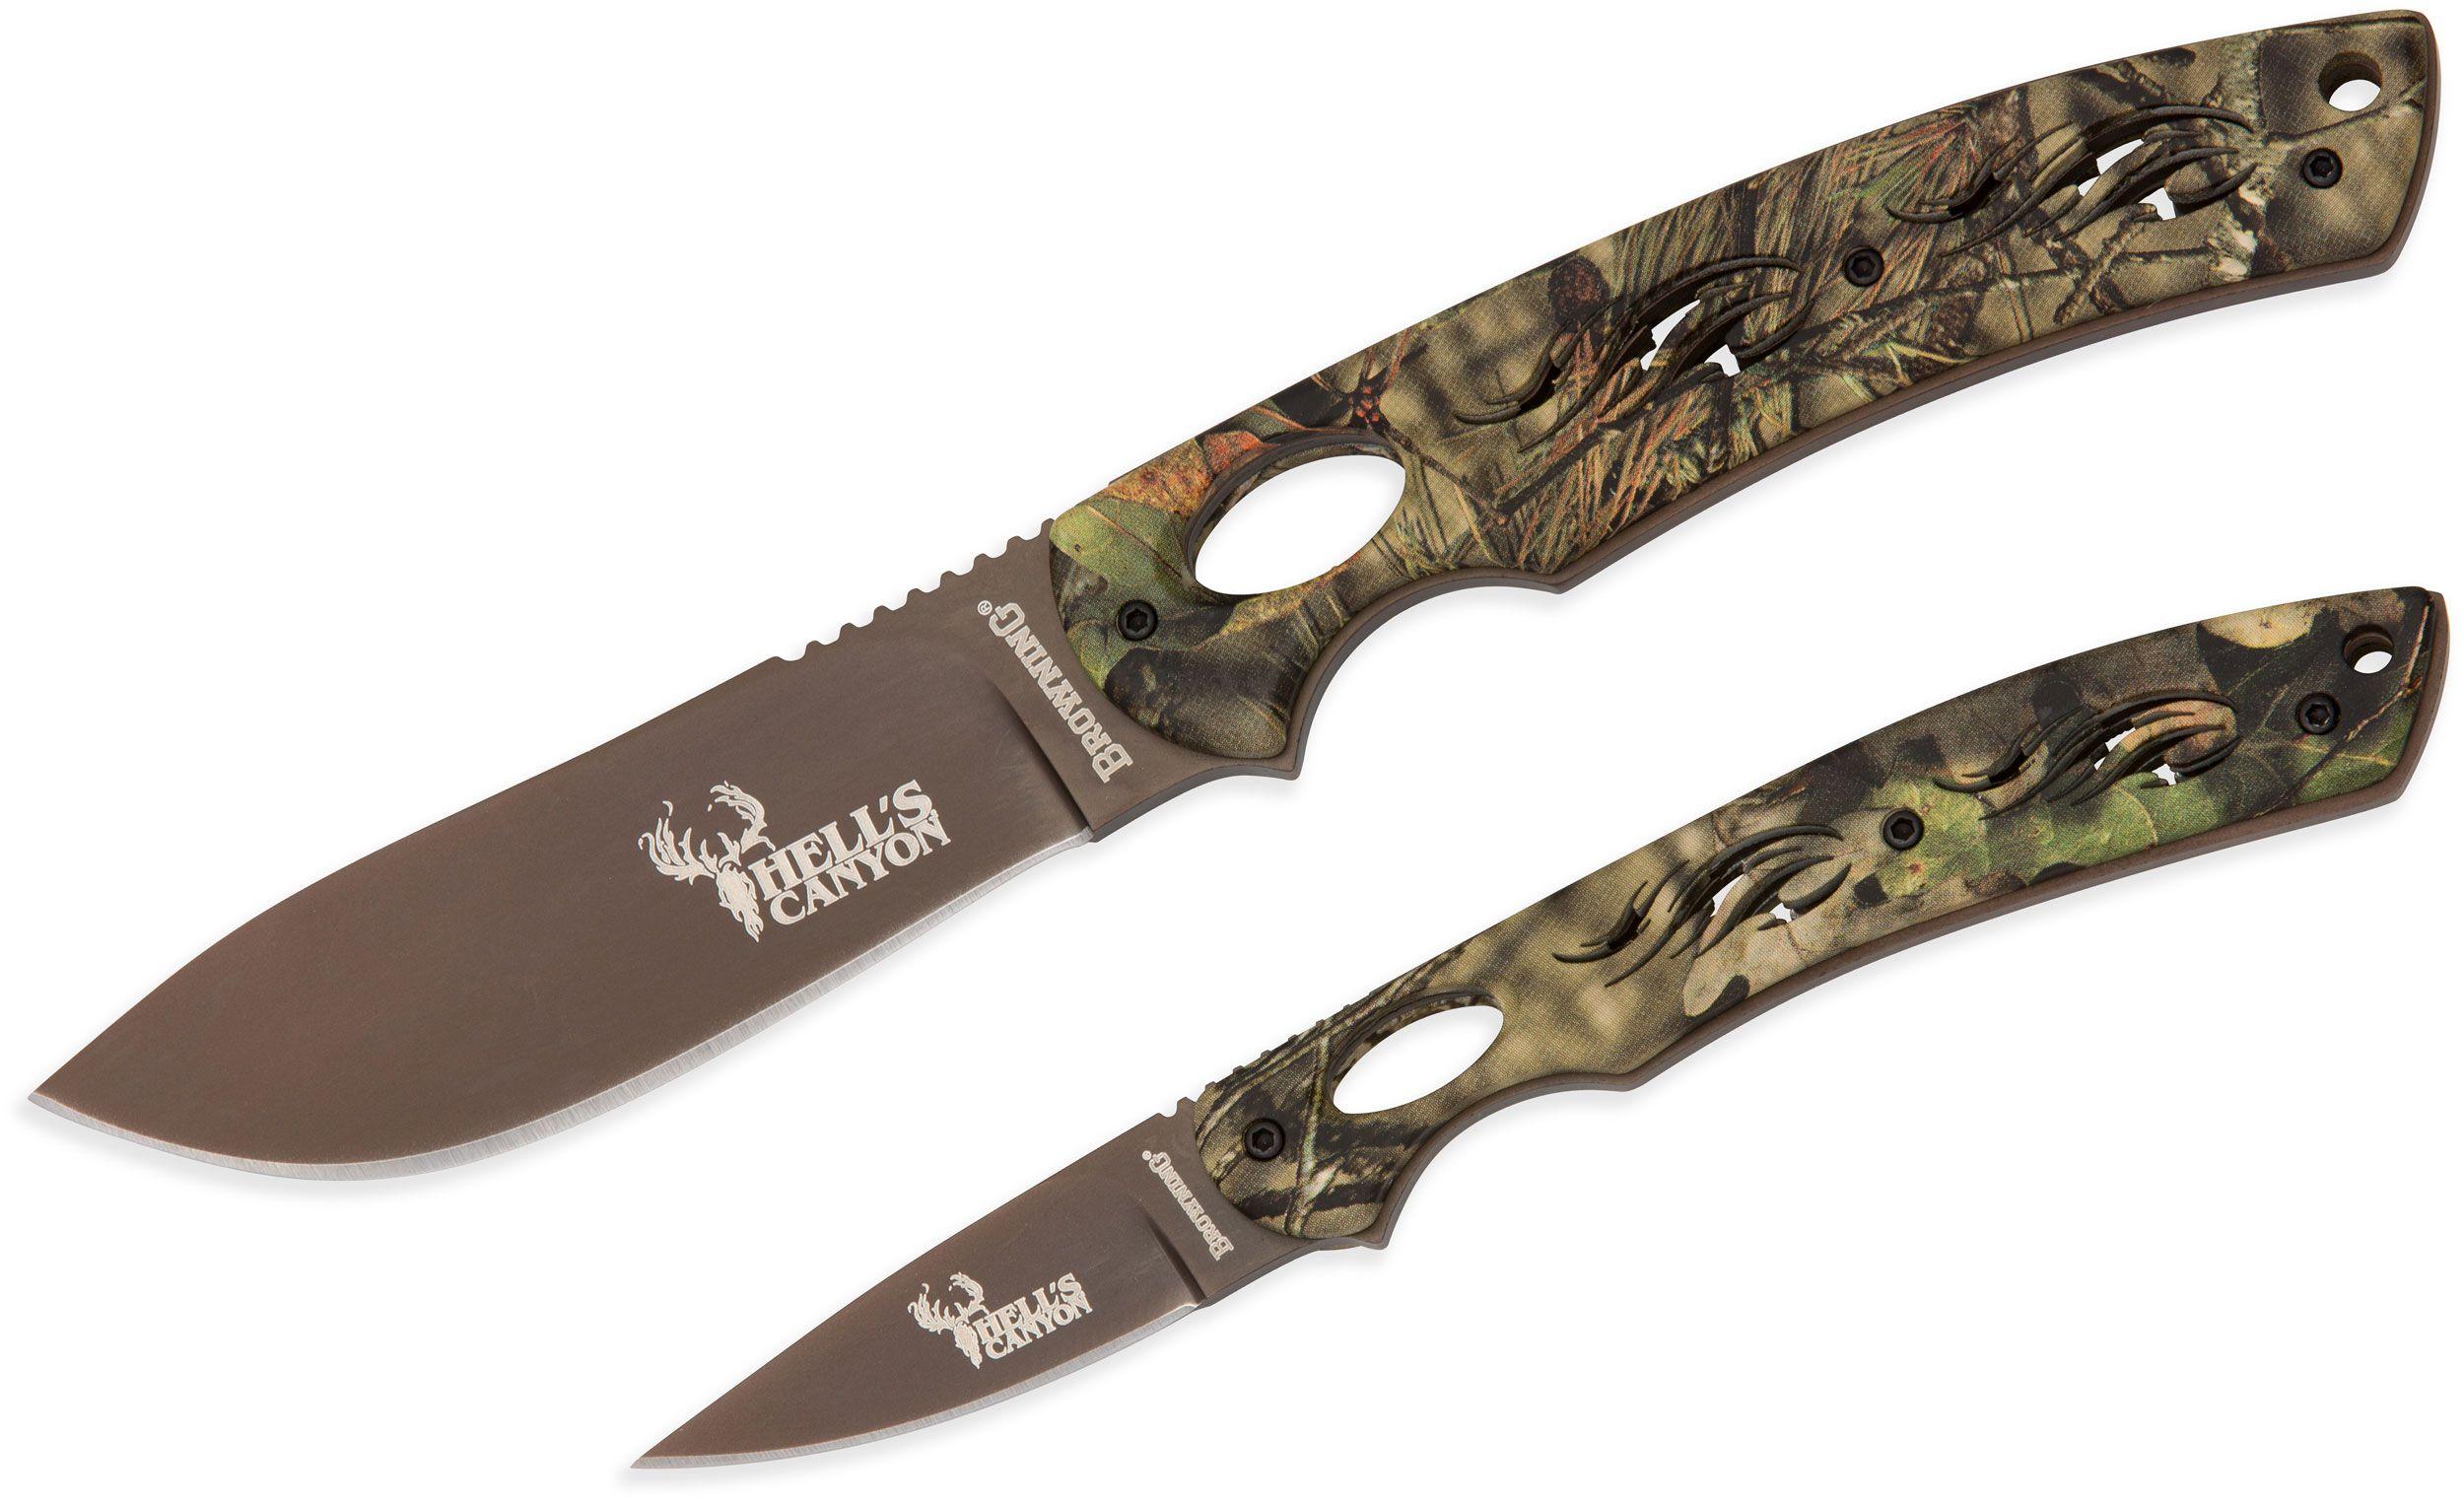 Browning Hell's Canyon Skeleton Fixed Blade Set, Mossy Oak Break-Up Country G10 Handles, Nylon Sheath